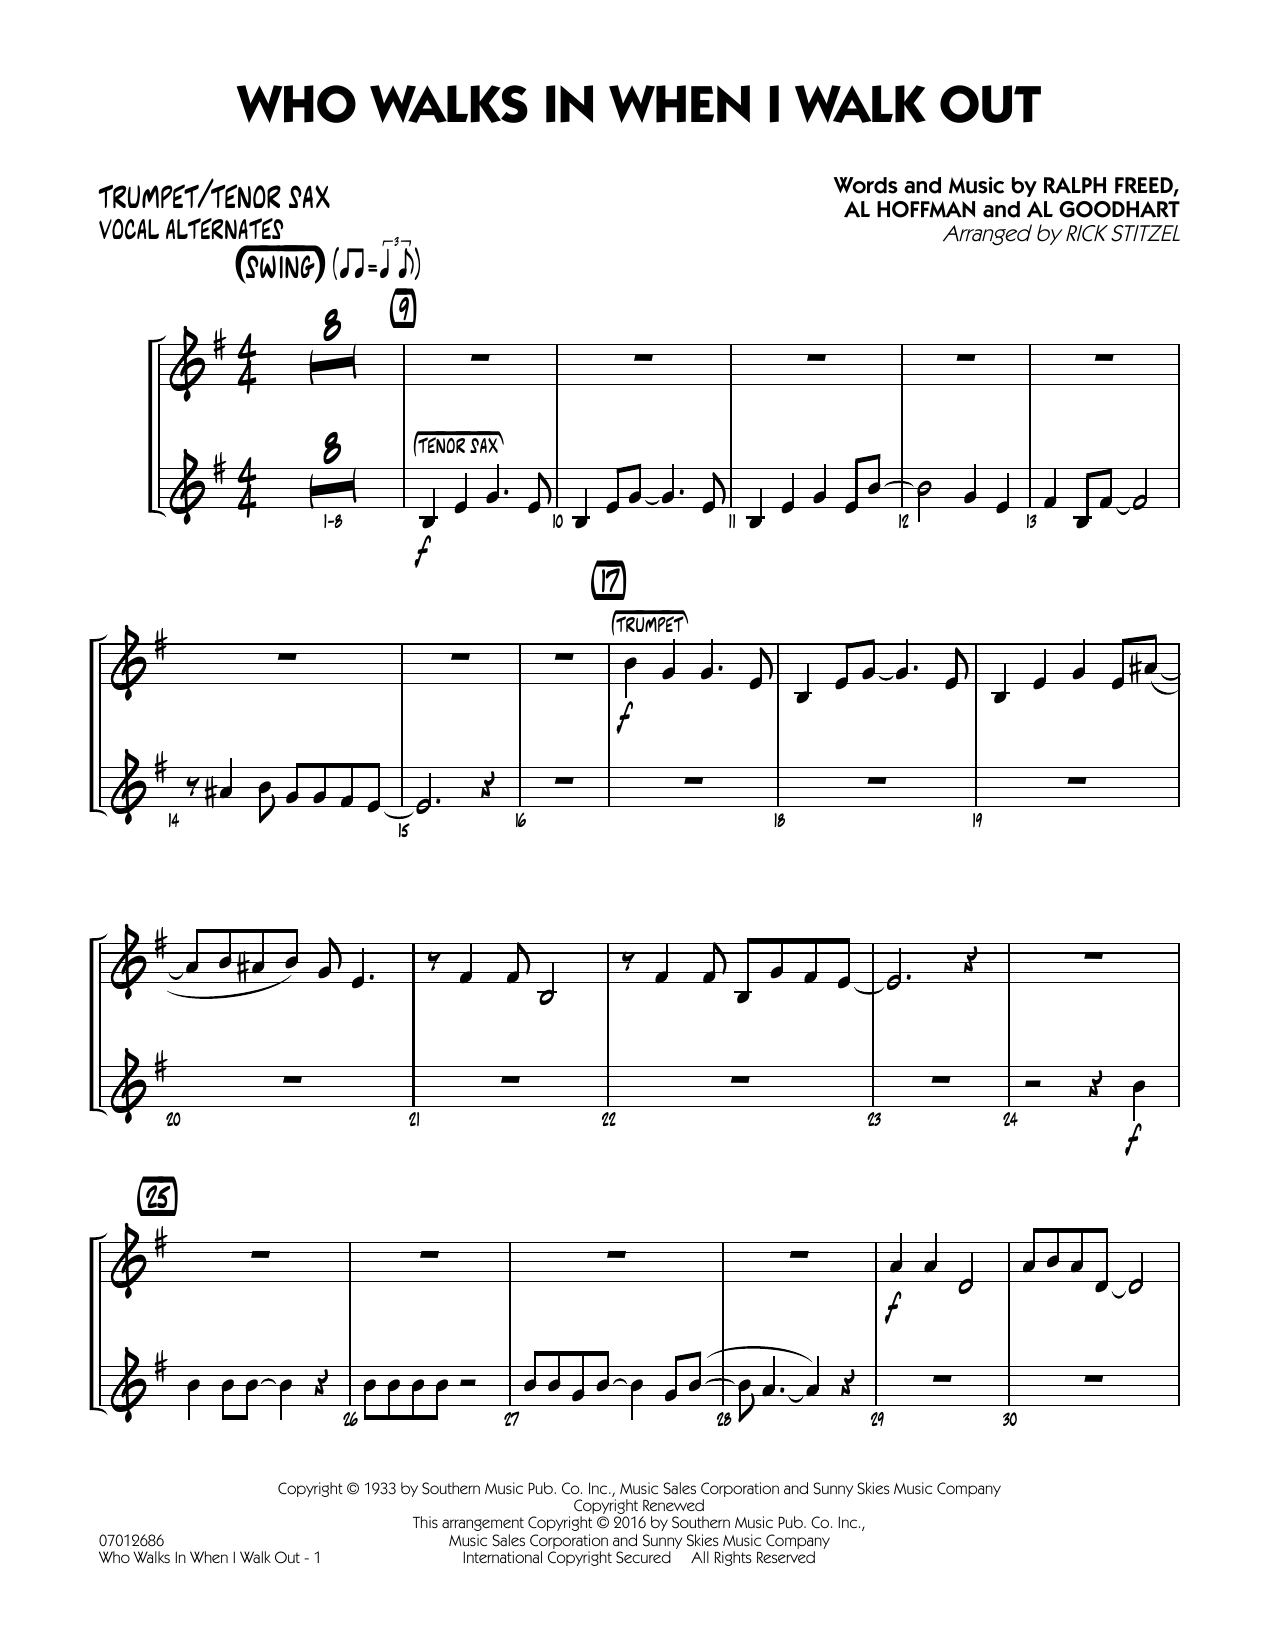 Who Walks In When I Walk Out? (Key: D minor) - Trumpet/Tenor Sax (Vocal Alt.) (Jazz Ensemble)